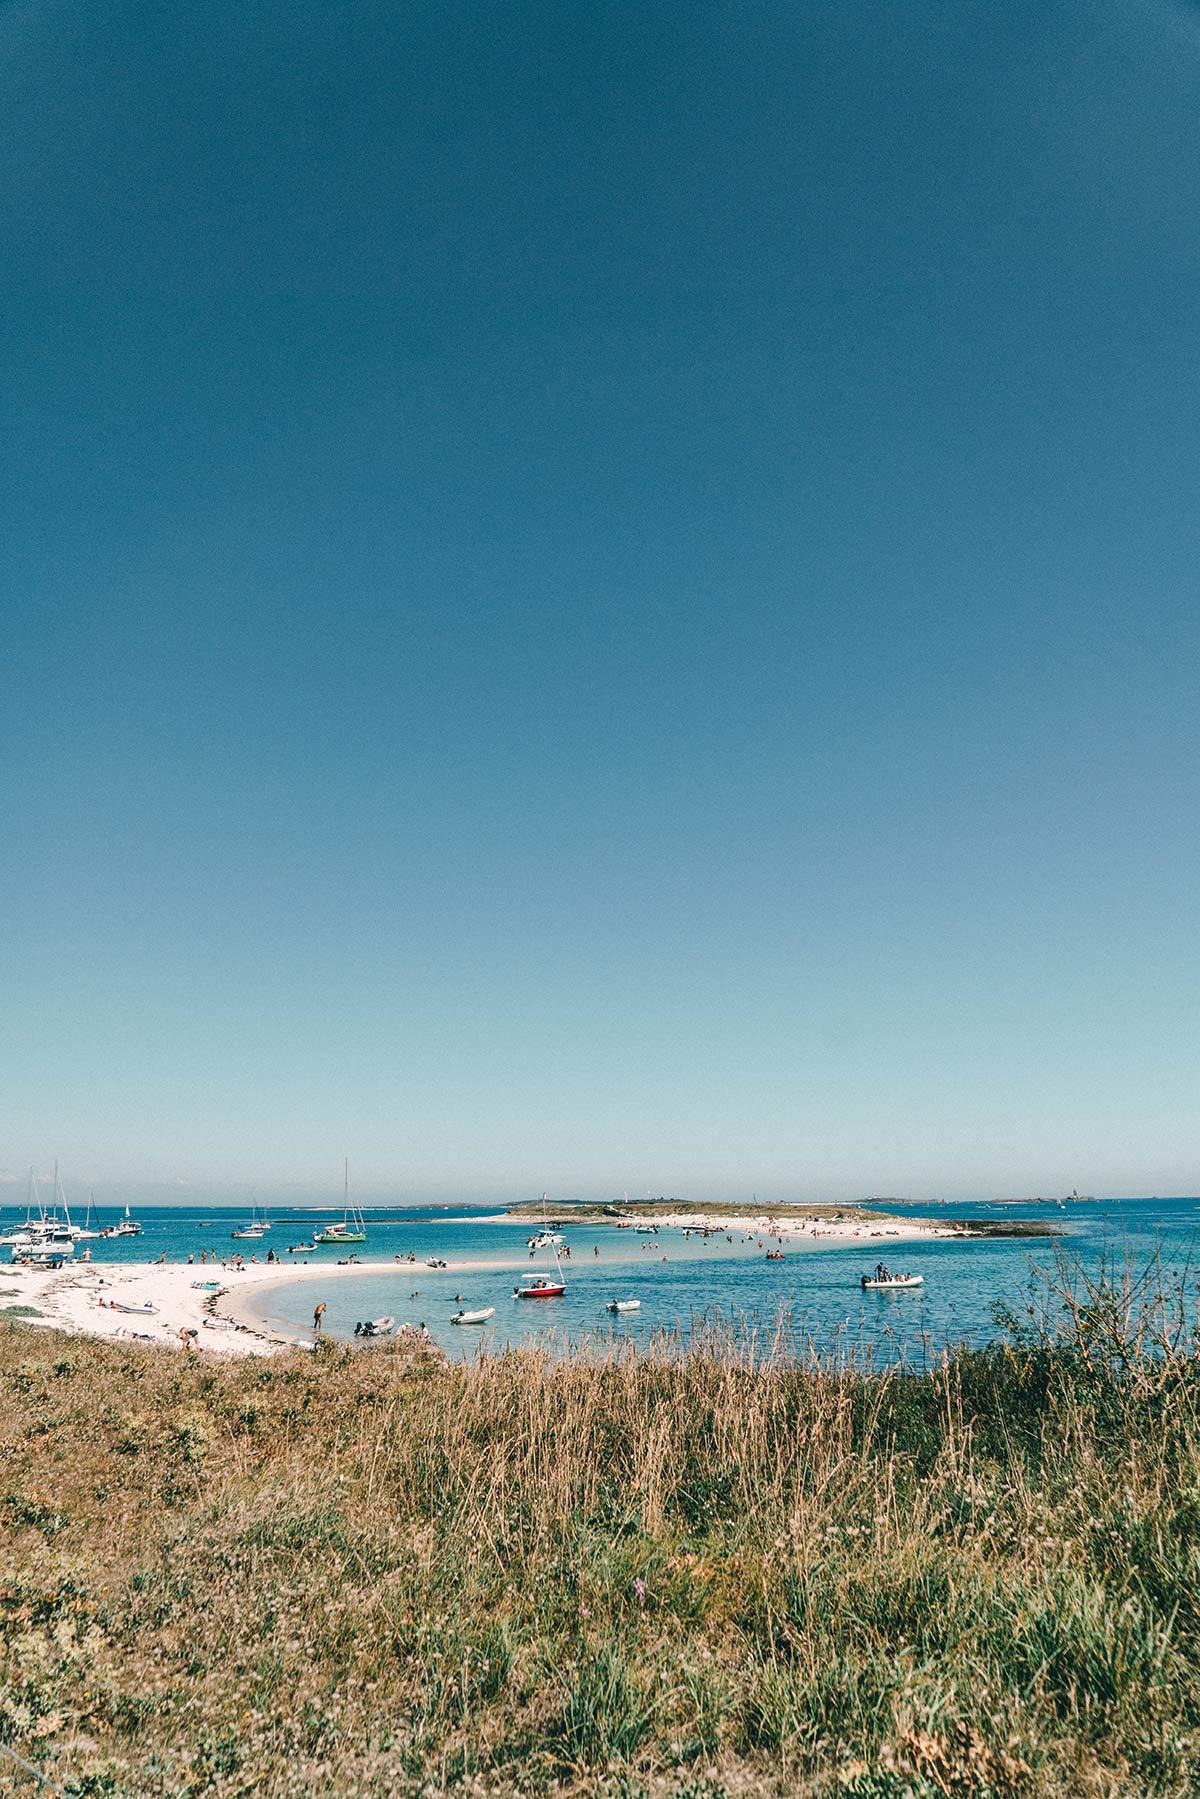 Badestrand der Glènan Inseln